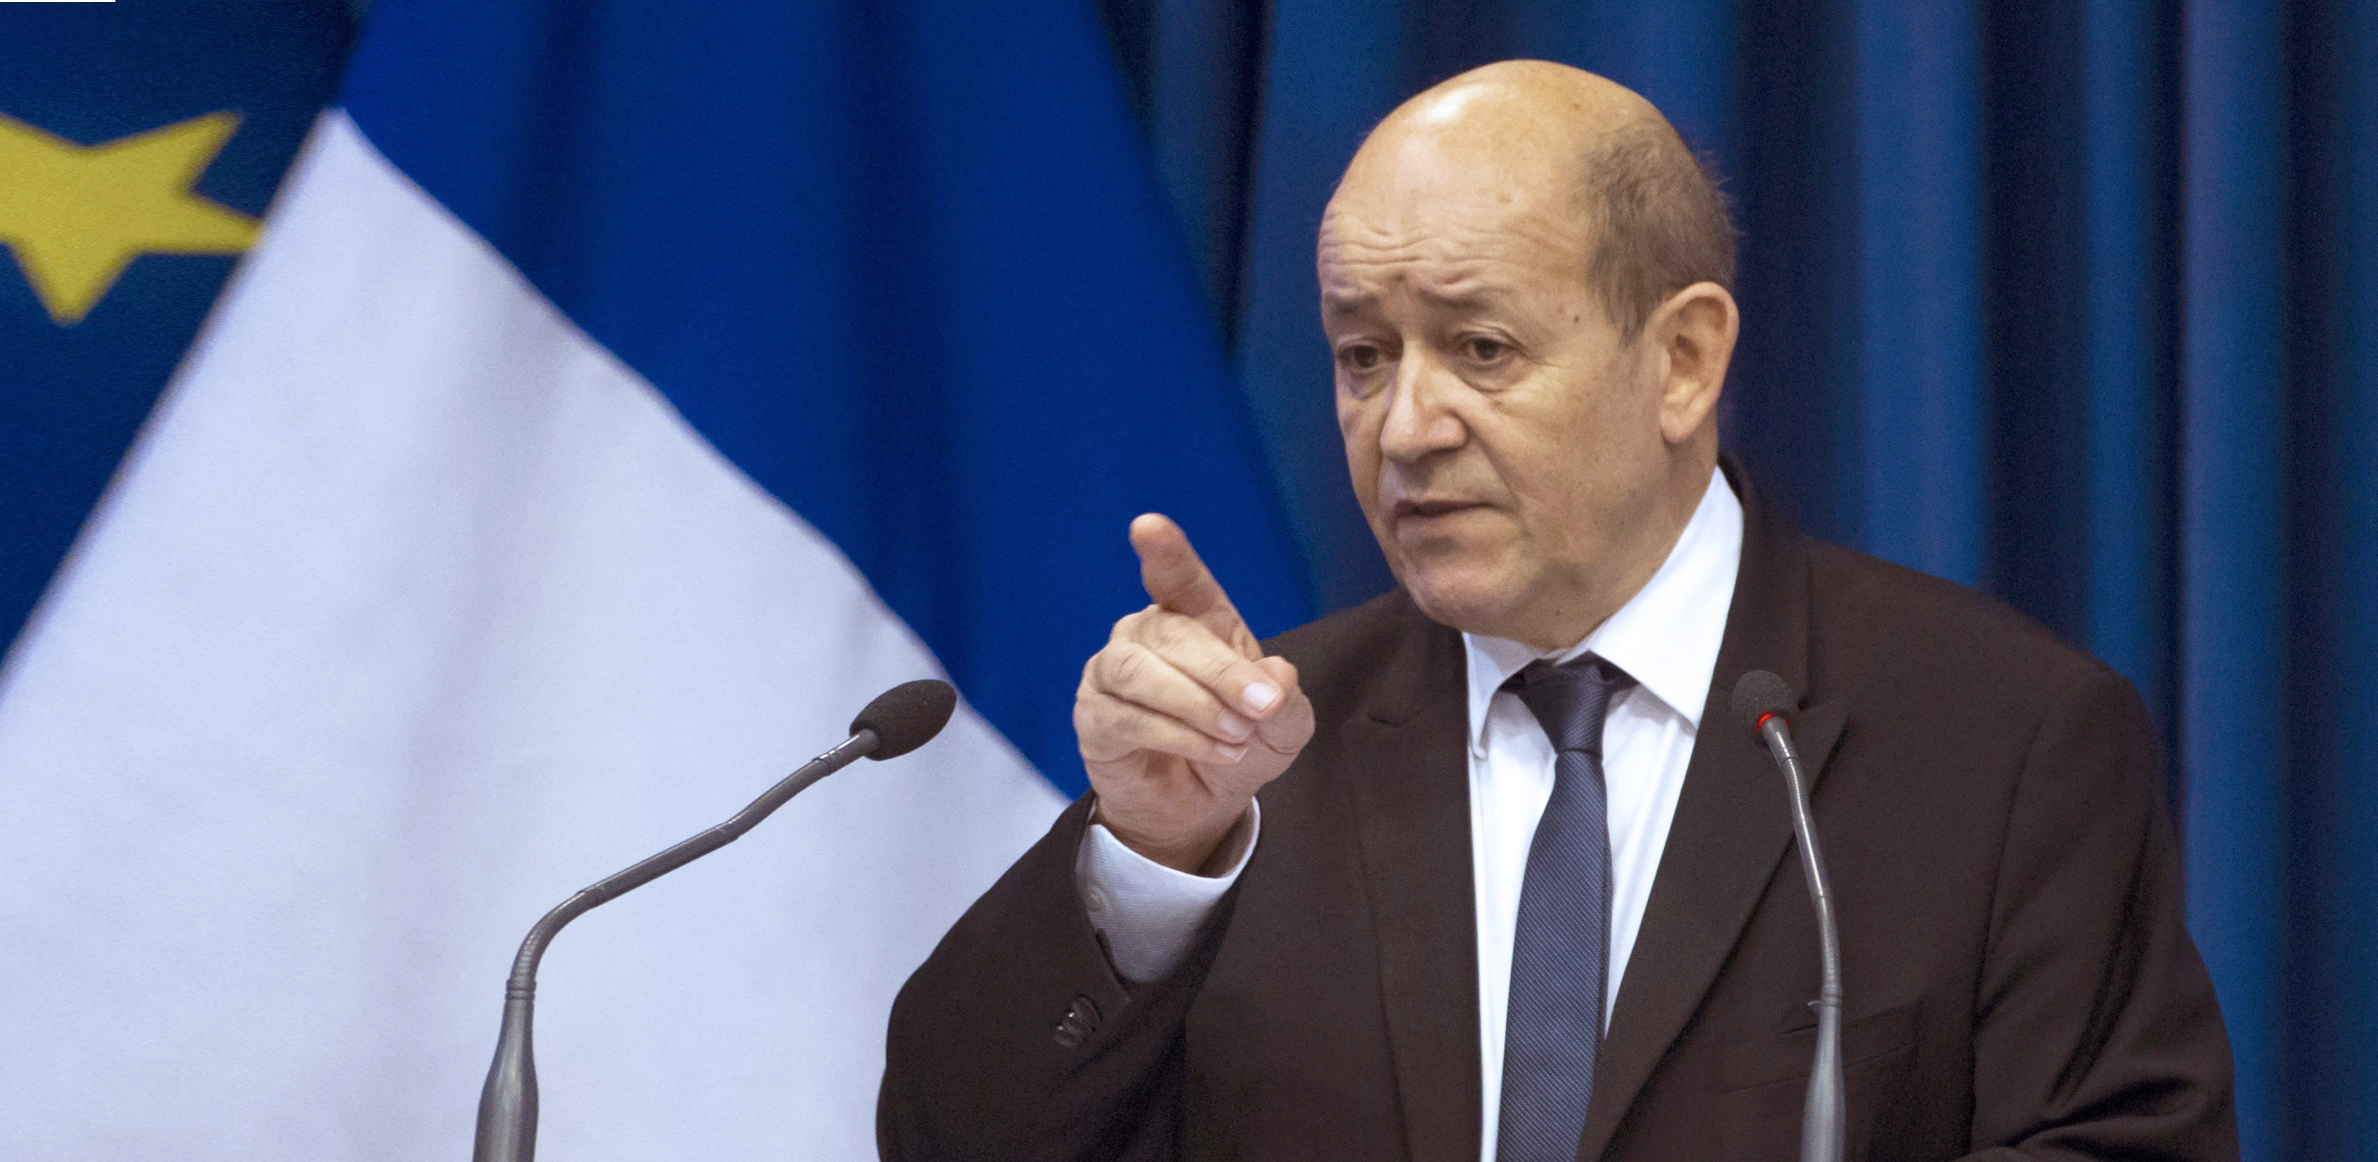 Ministrul francez de Externe, Jean-Yves Le Drian, avertizează dur Kremlinul